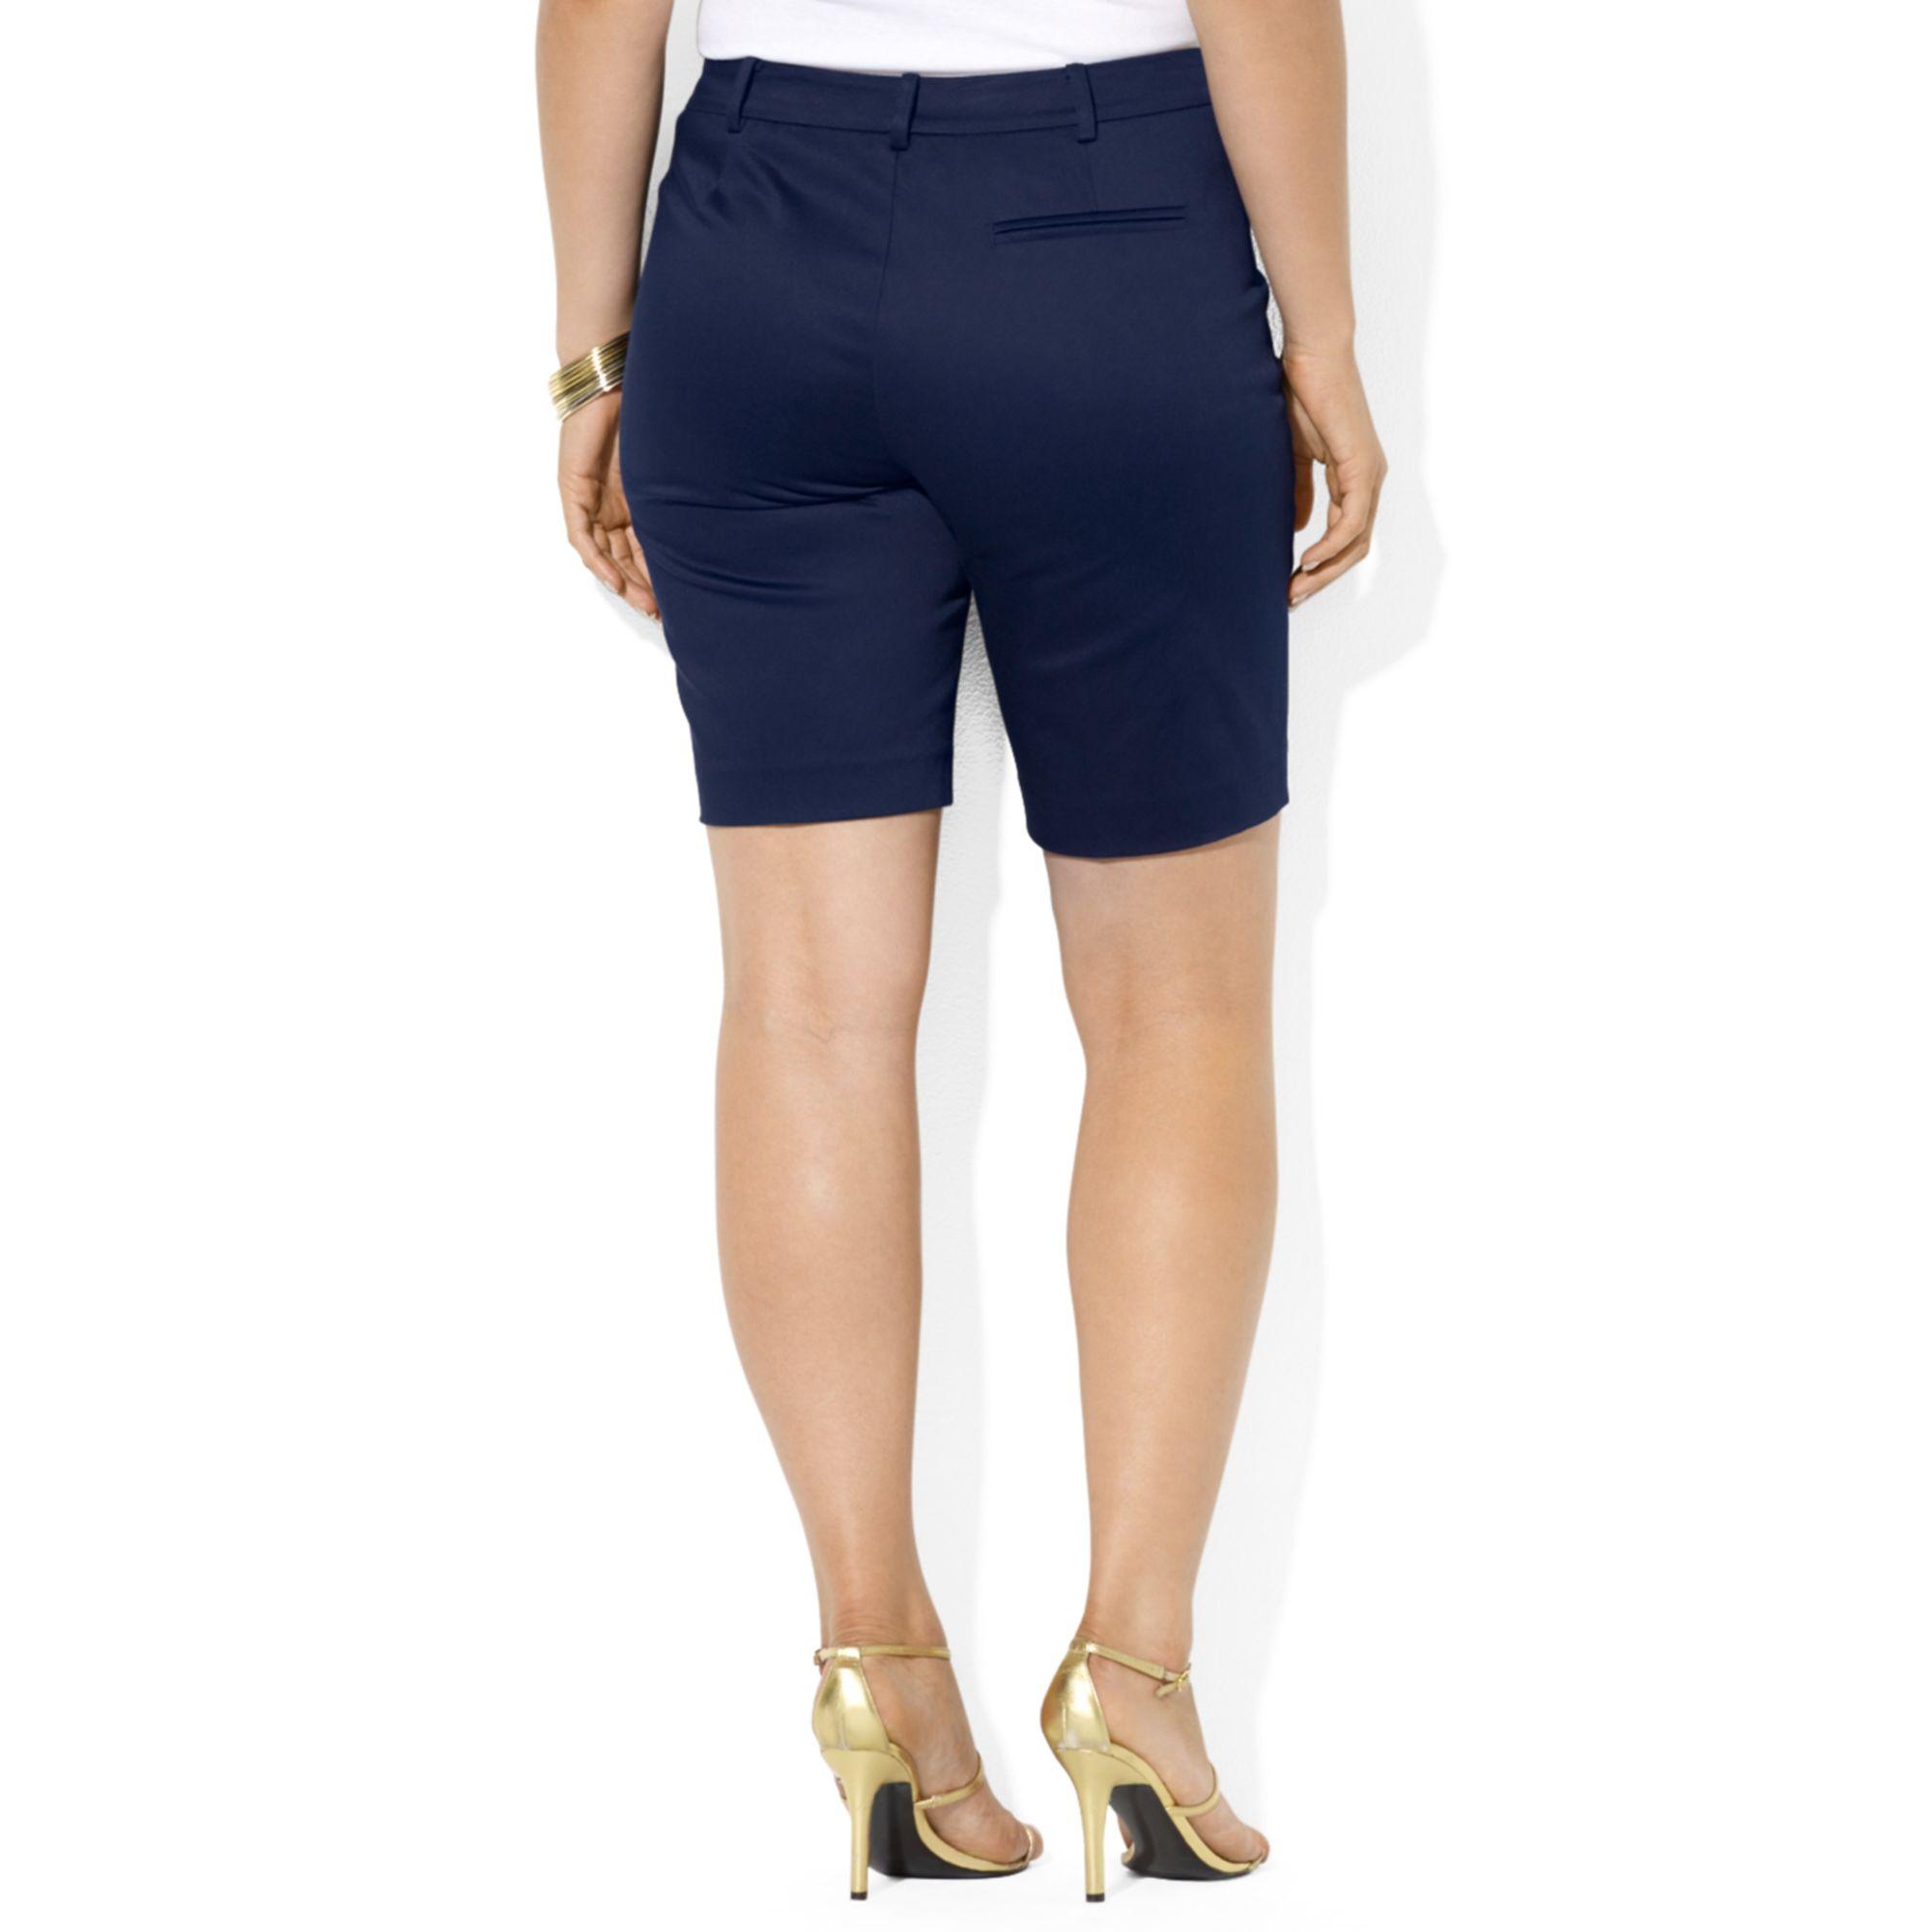 6a617935c1 Lauren by Ralph Lauren Plus Size Sateen Bermuda Shorts in Blue for ...